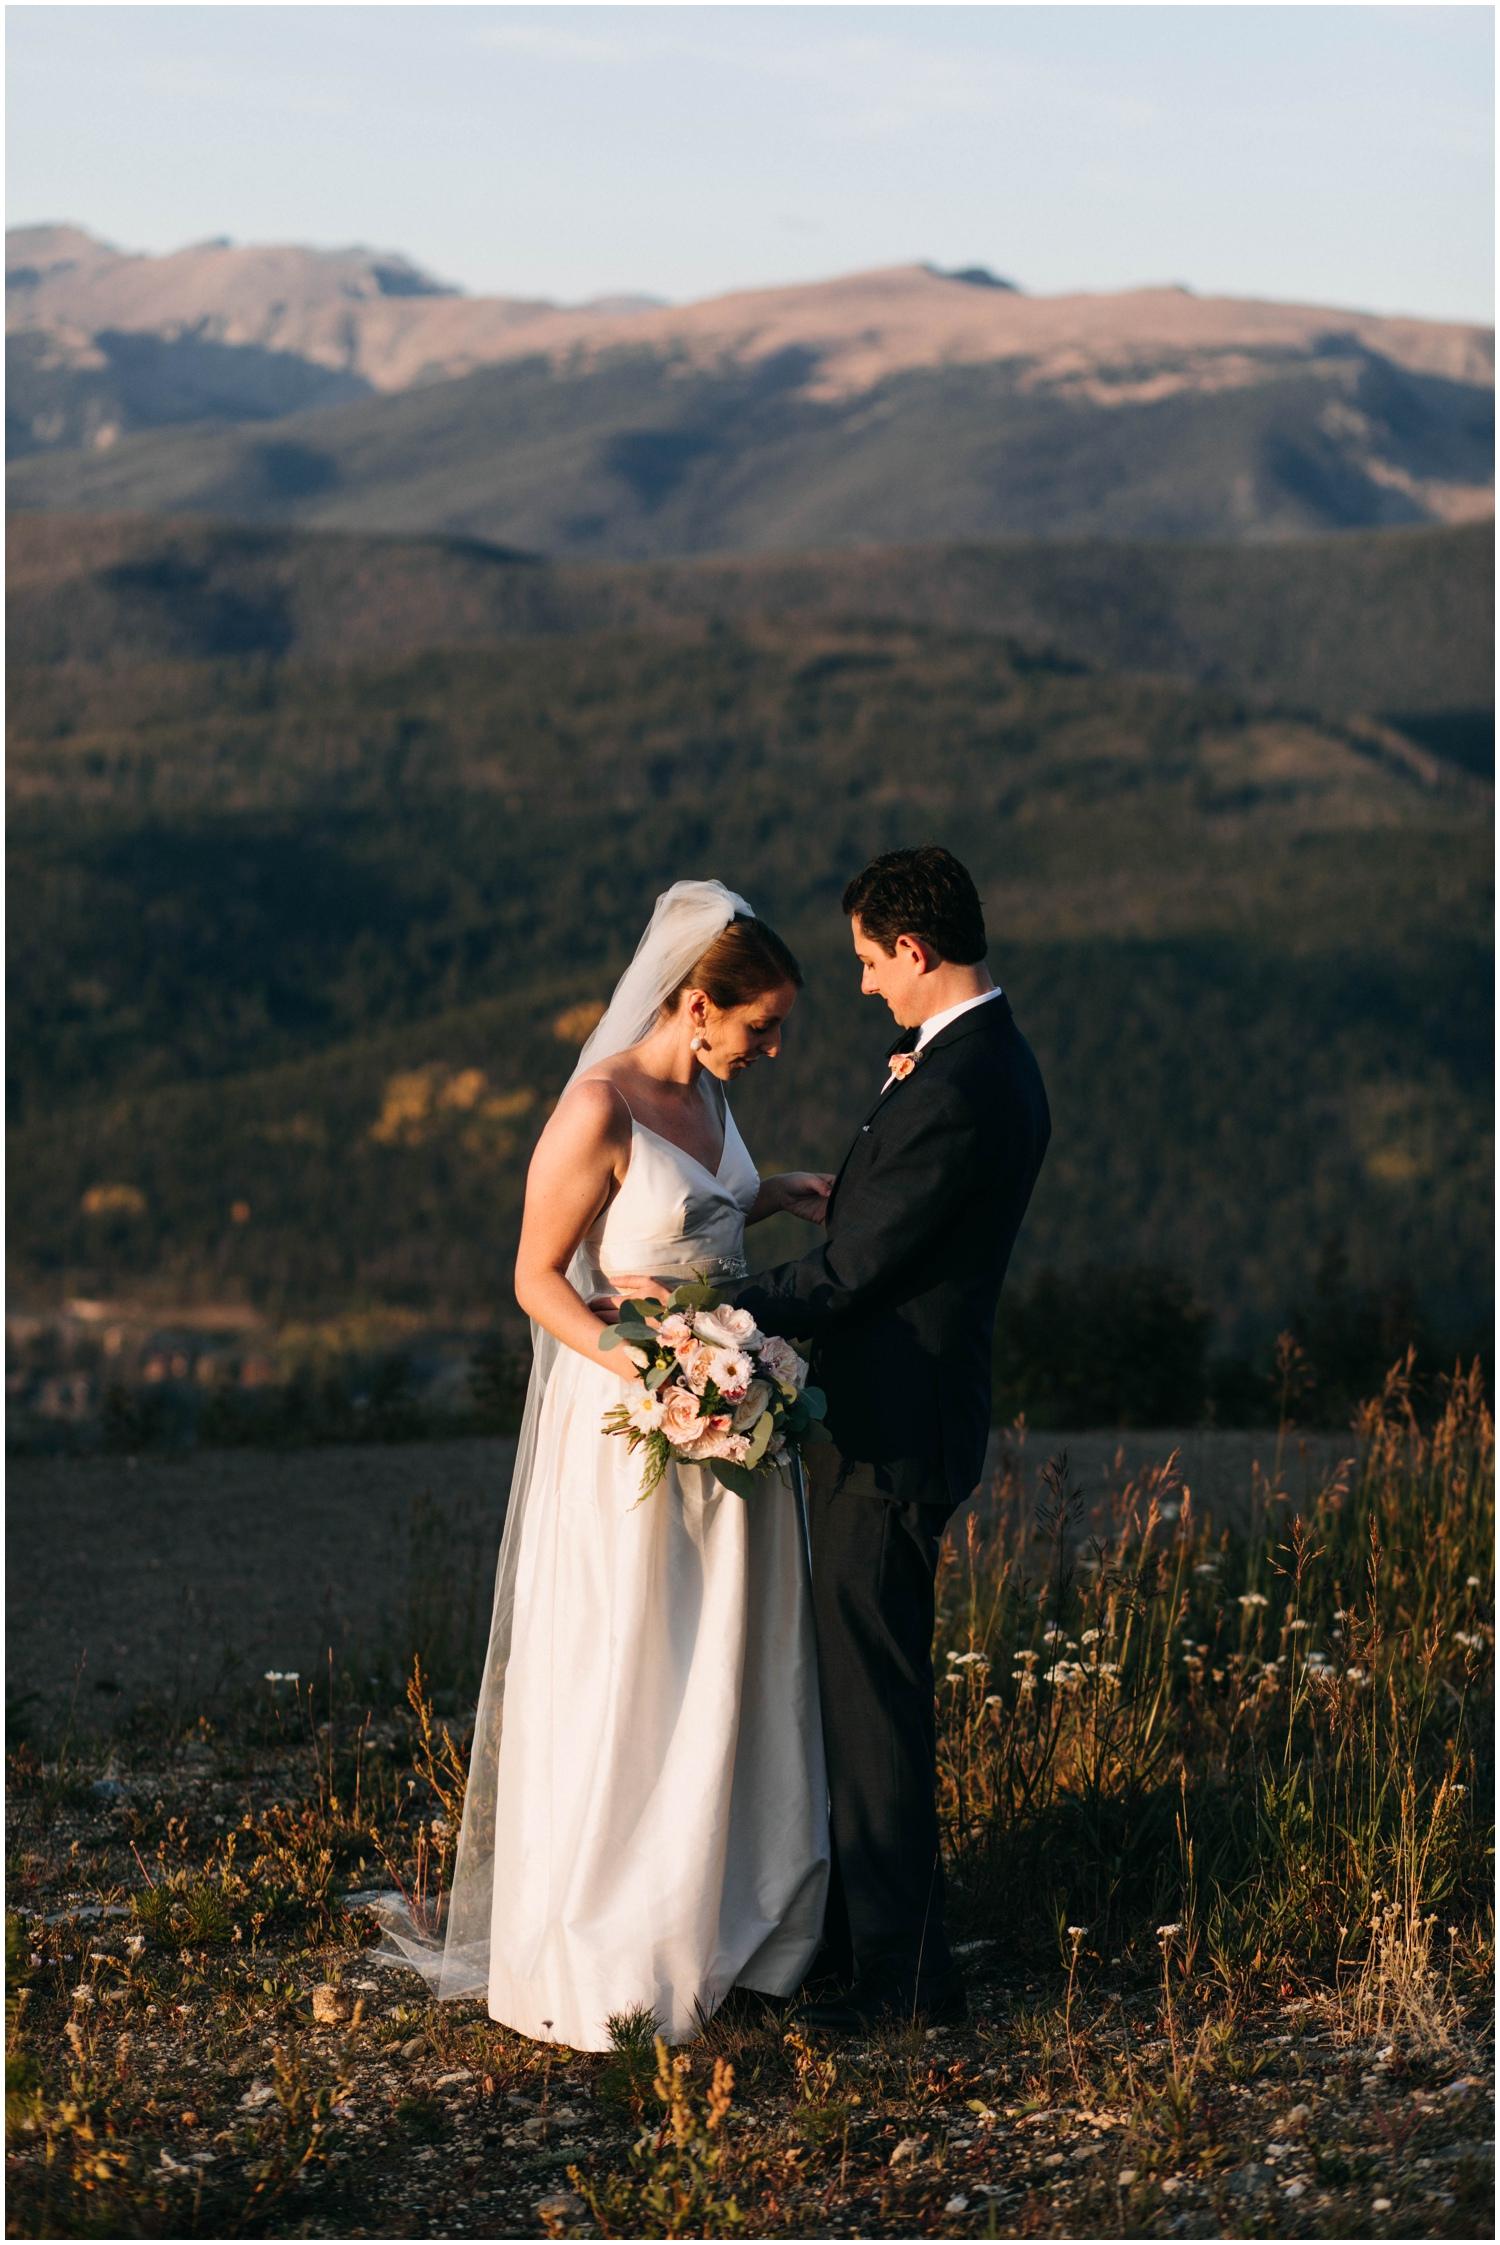 NadegeandJoe_elegant_winter_park_wedding_lodge_at_sunspot_mountain_taylor_powers_0207.jpg